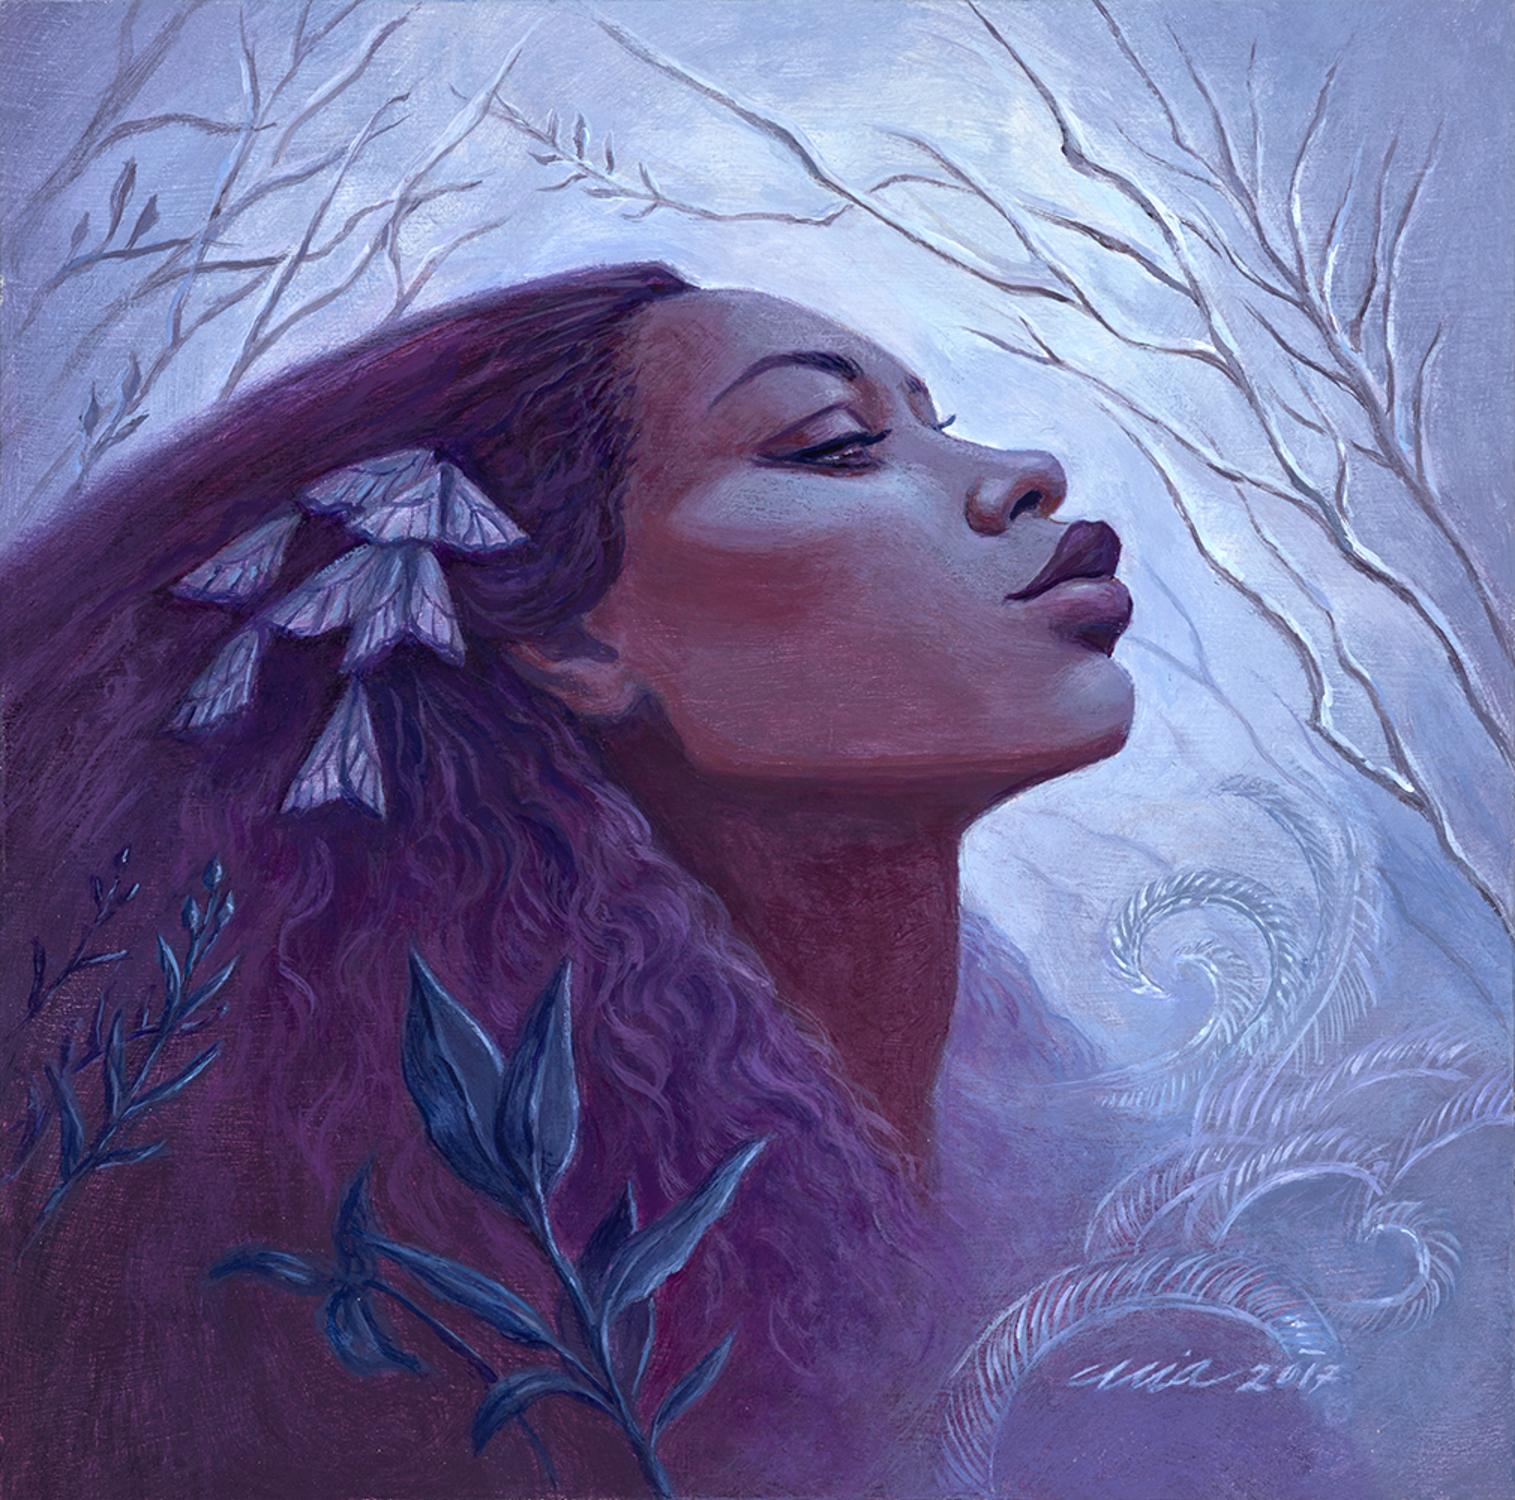 Morning Frost Artwork by Mia Araujo